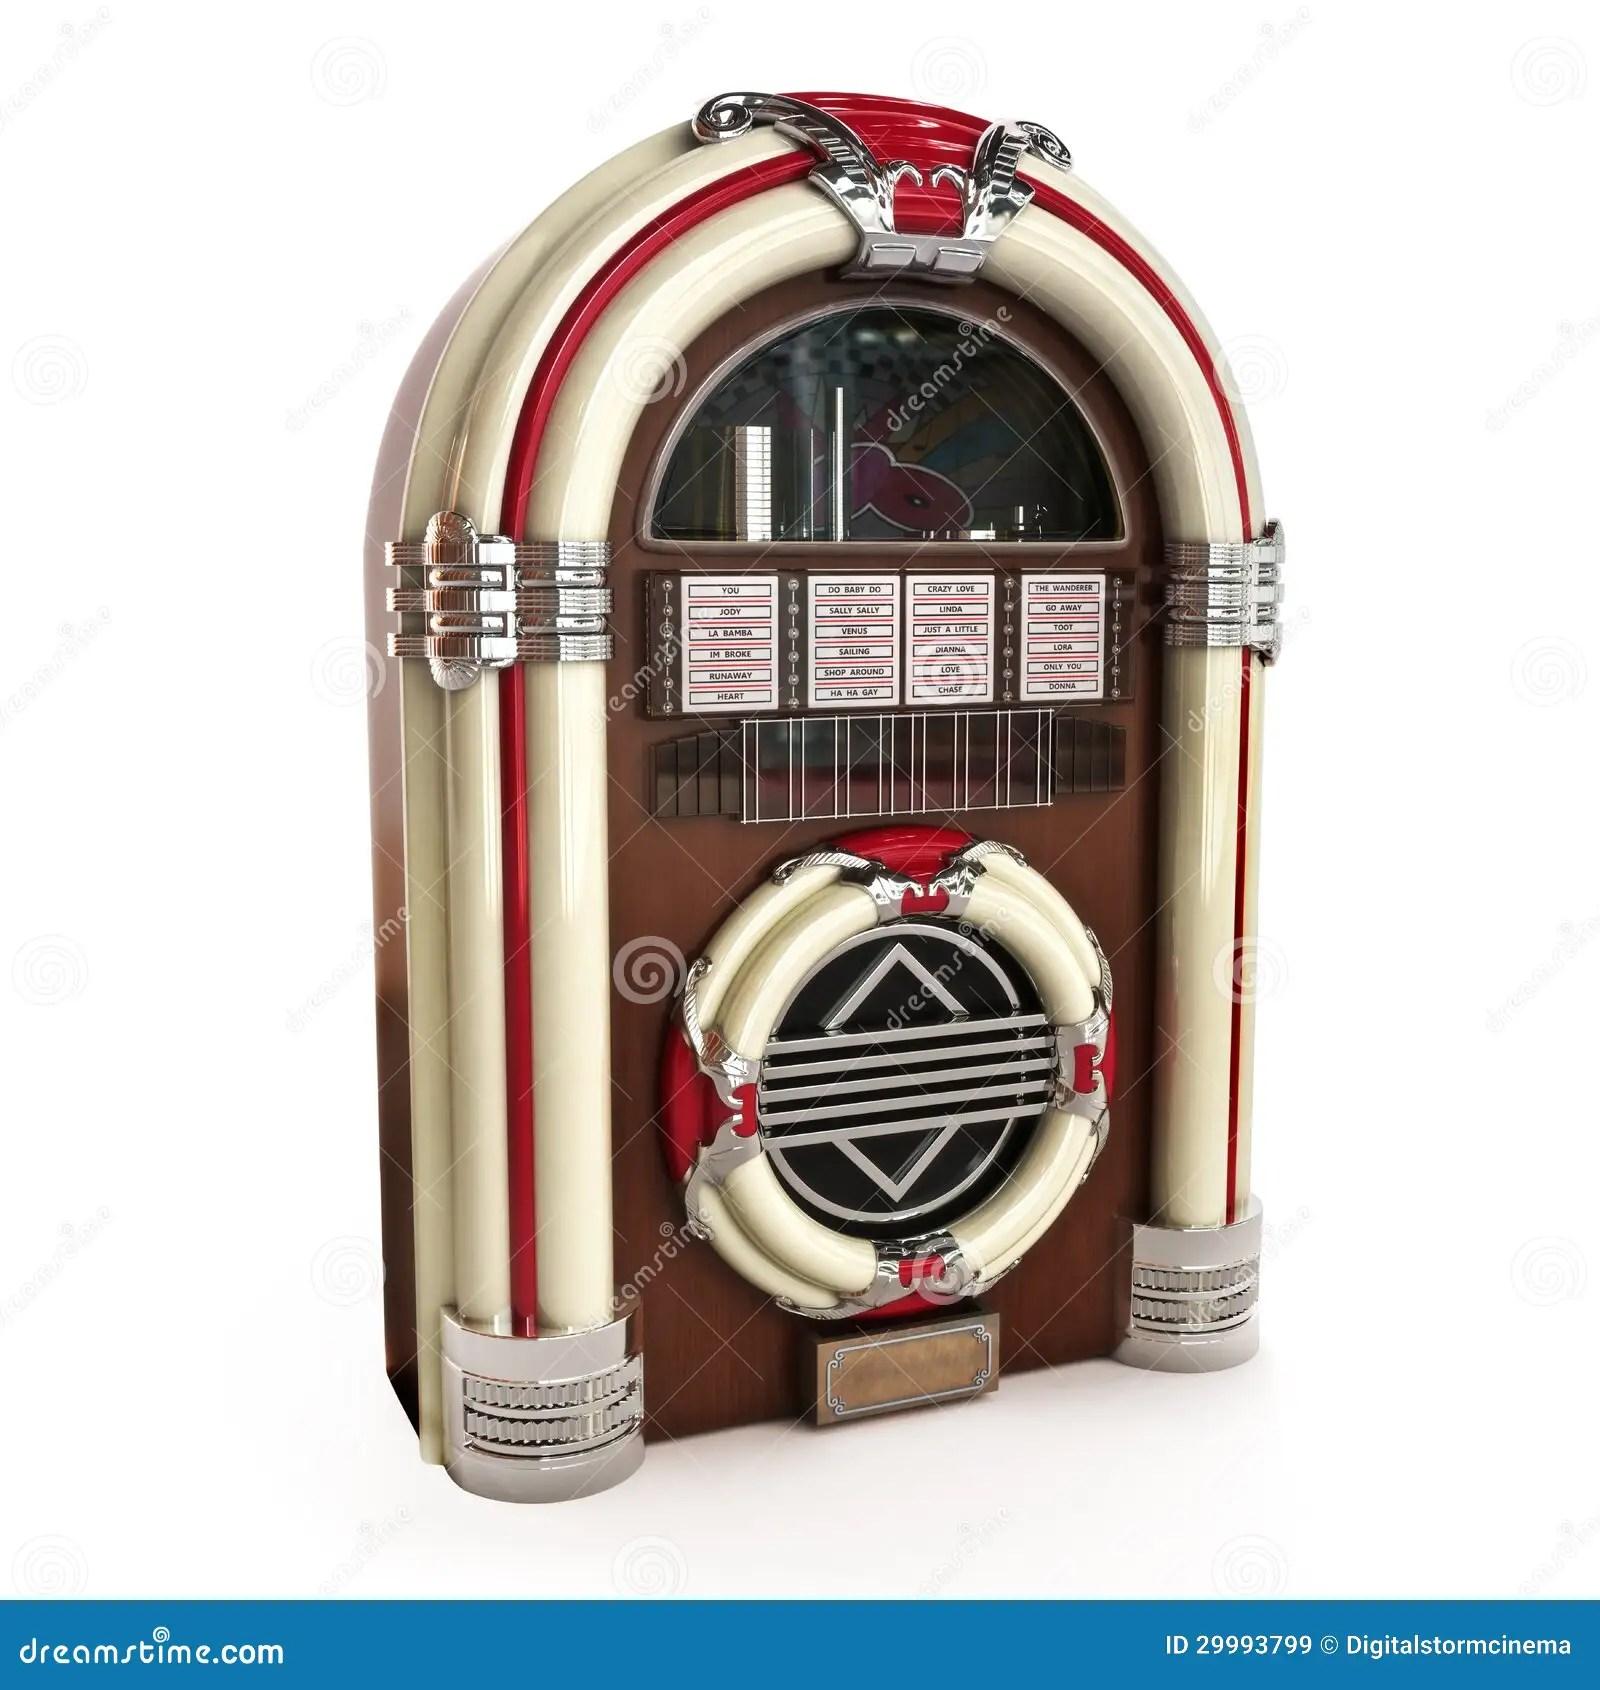 hight resolution of retro vintage jukebox on a white background 3d model royalty free illustration